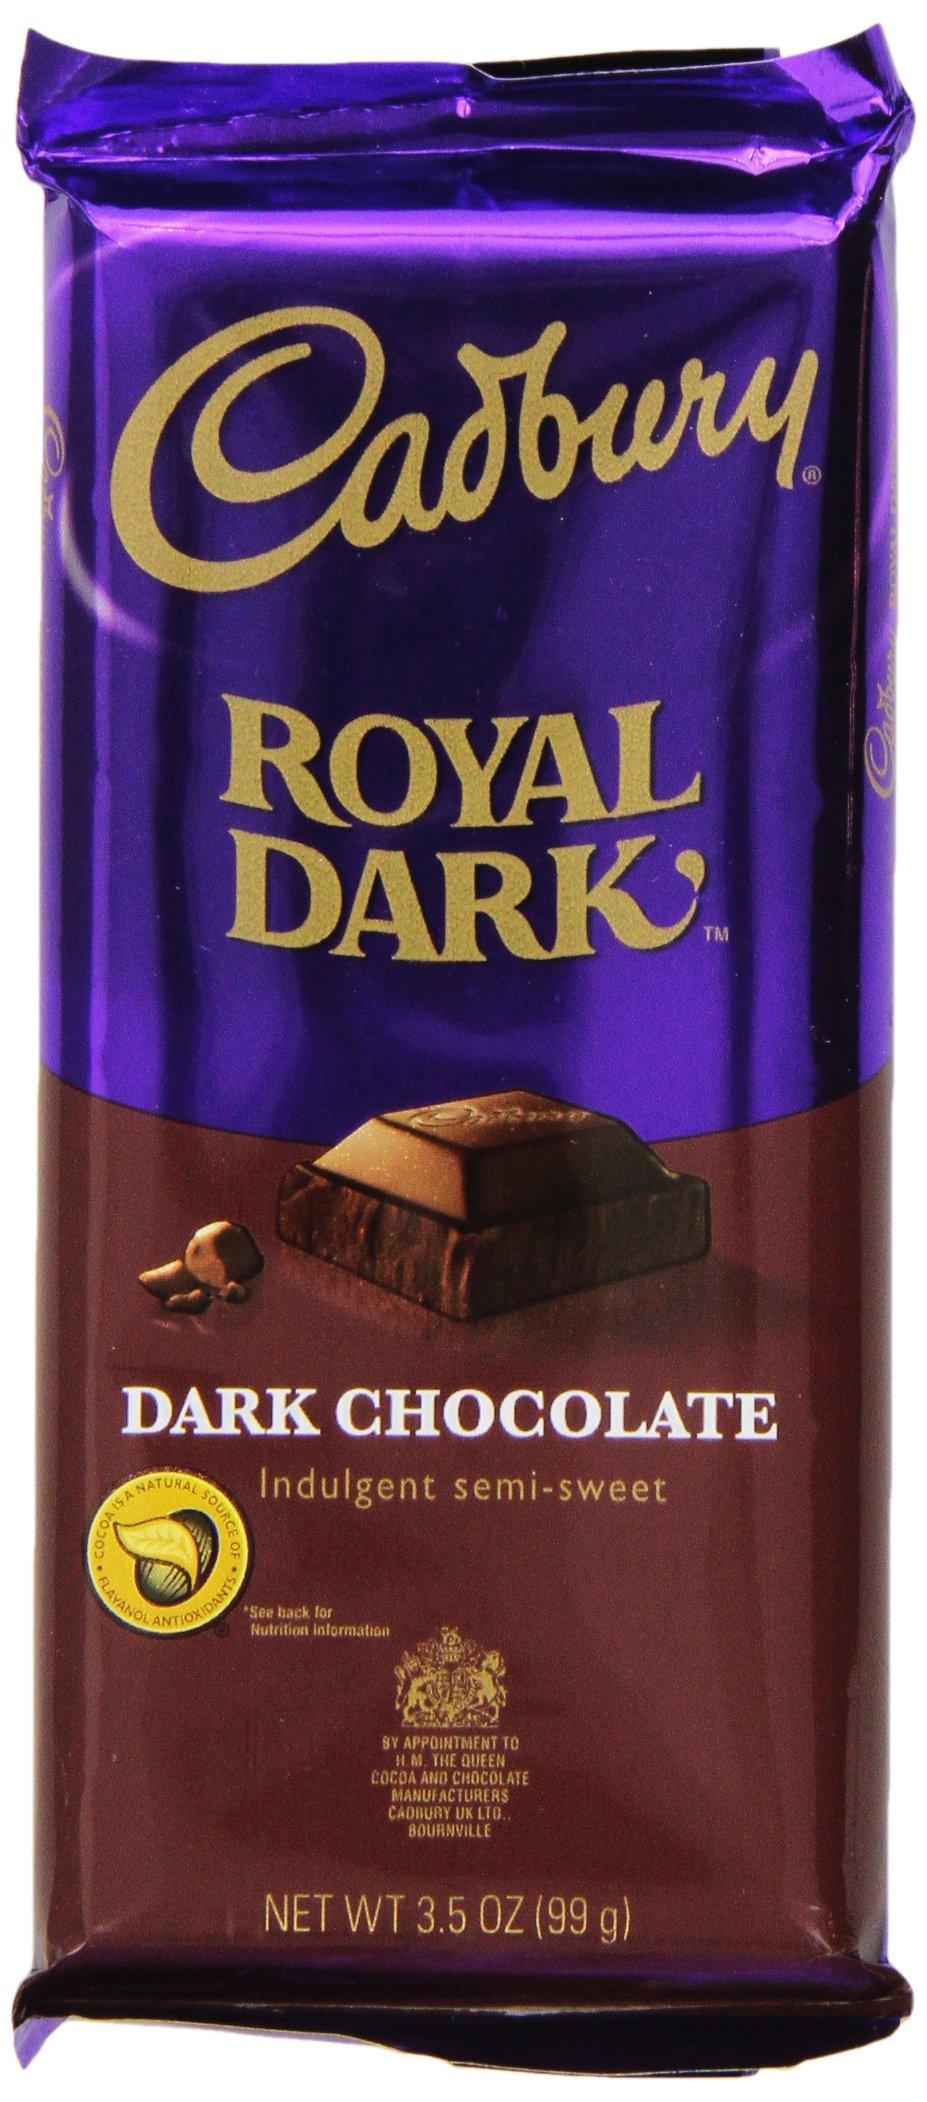 CADBURY Chocolate Candy Bar, Royal Dark Chocolate, 3.5 Ounce (Pack of 12)